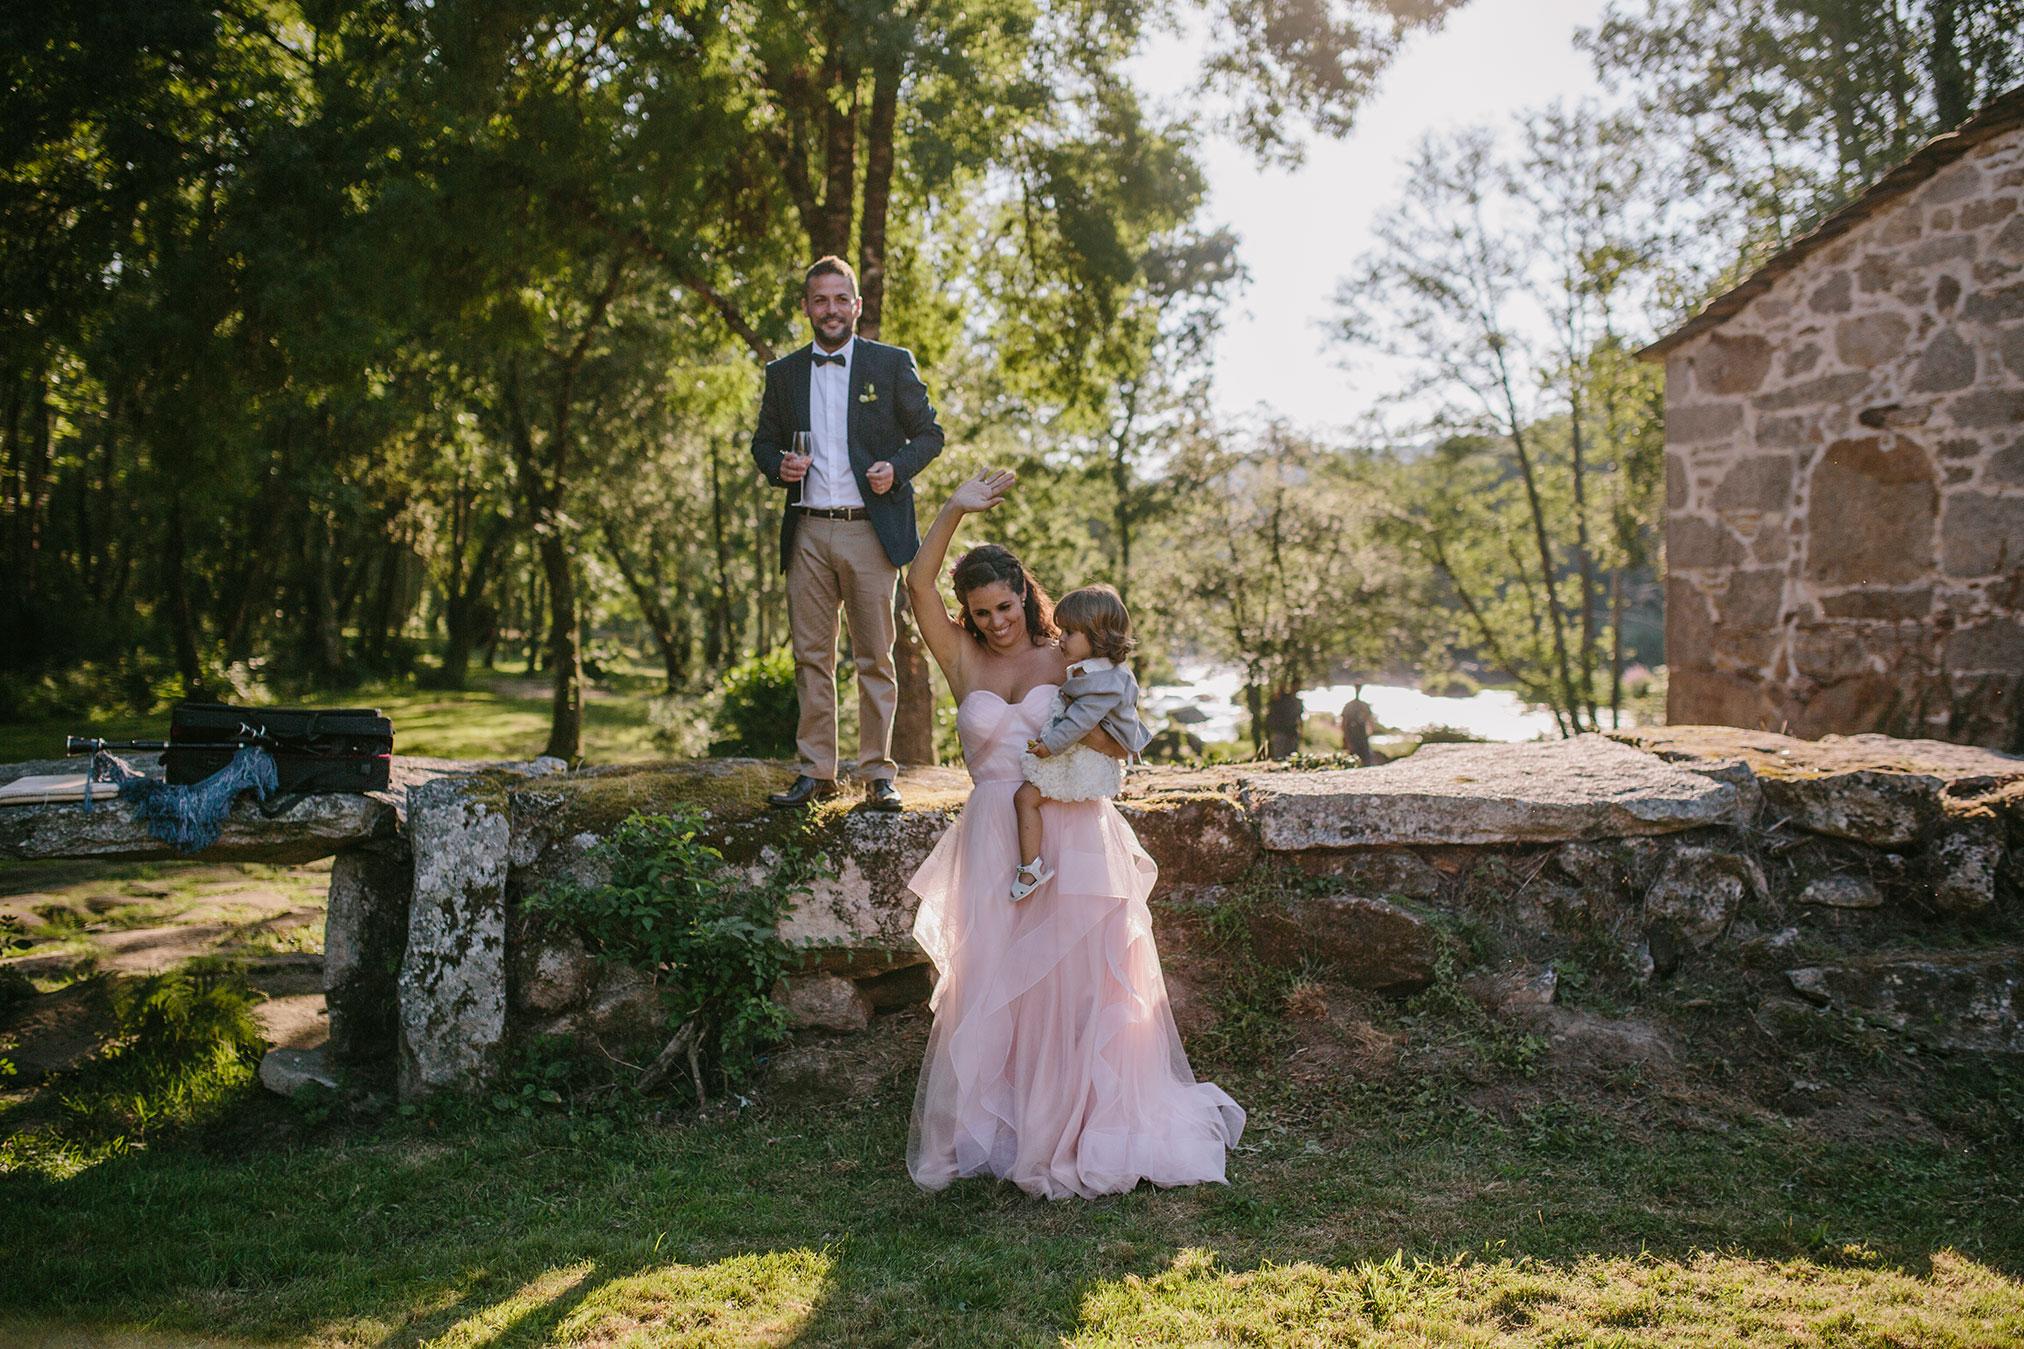 Wedding Photographer Graciela Vilagudin Dublin Galicia 829.jpg